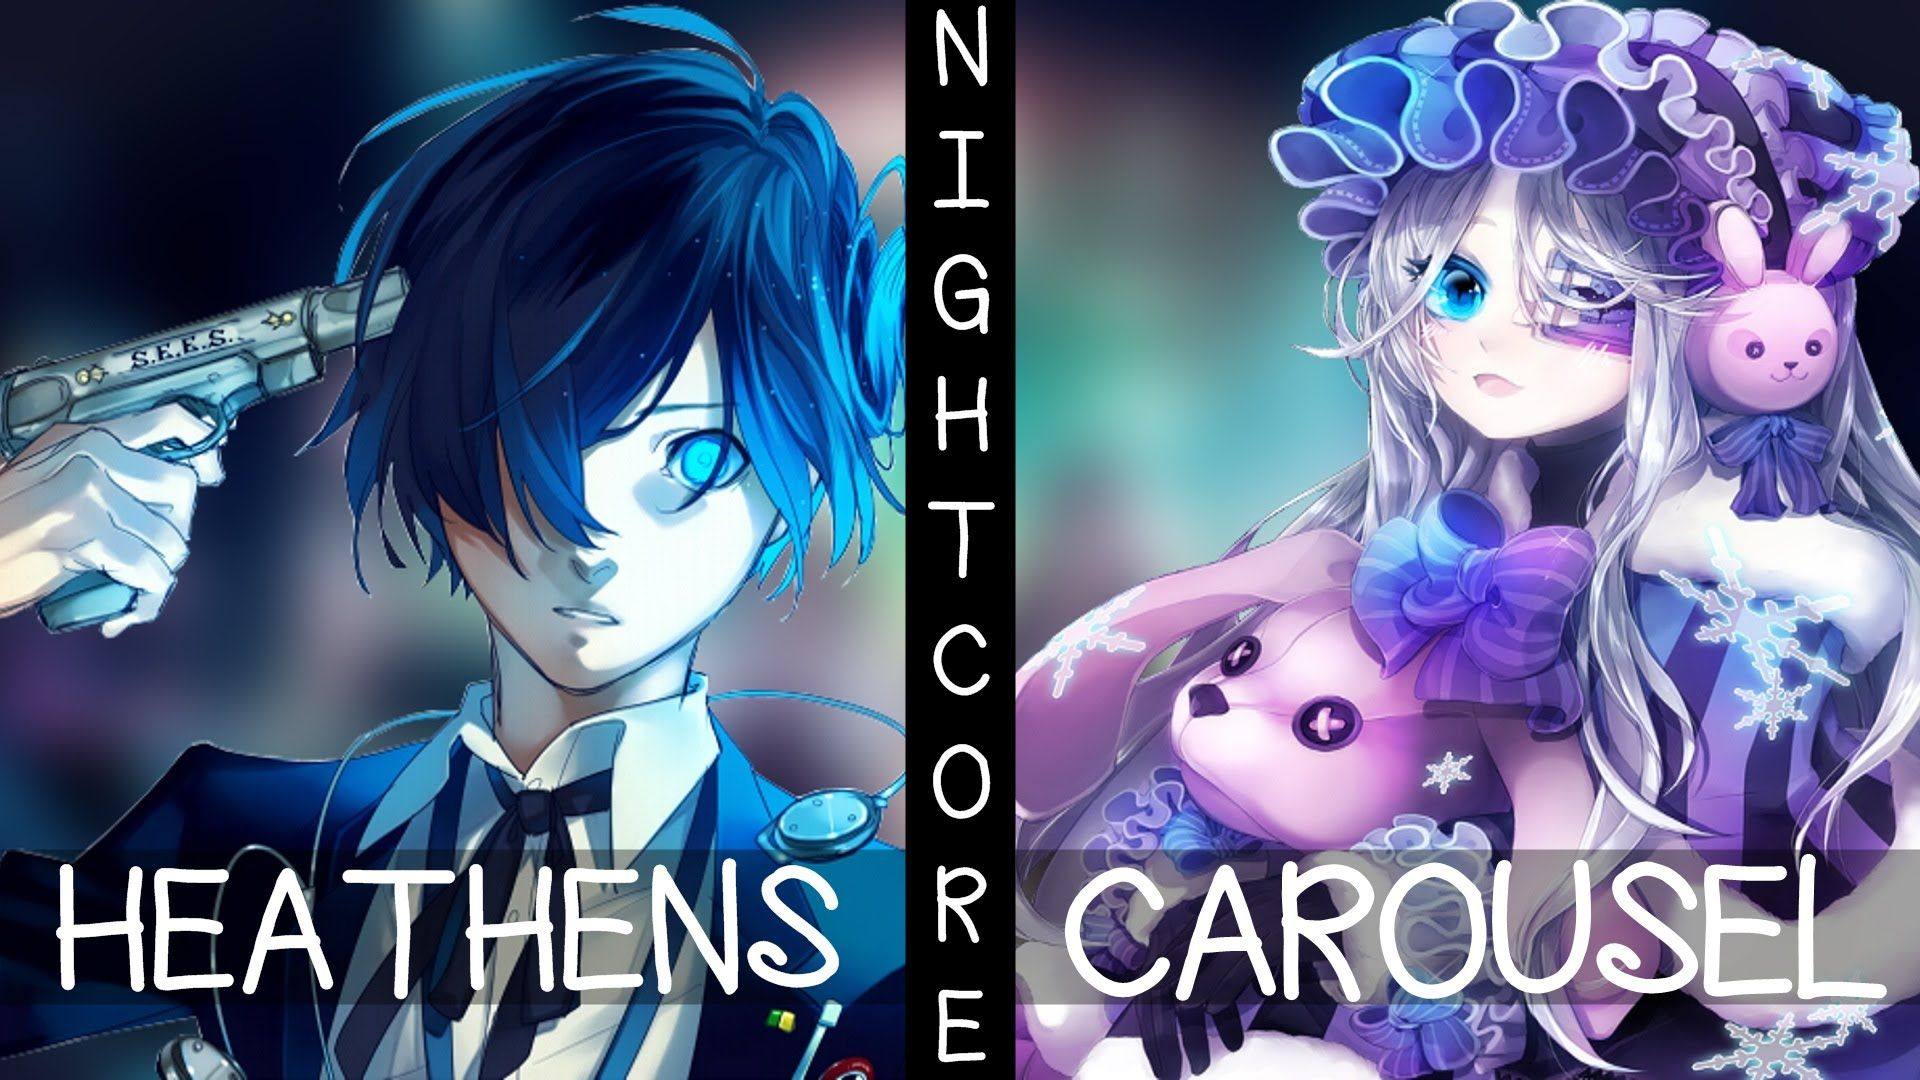 ♪ Nightcore - Heathens / Carousel (Switching Vocals) i am